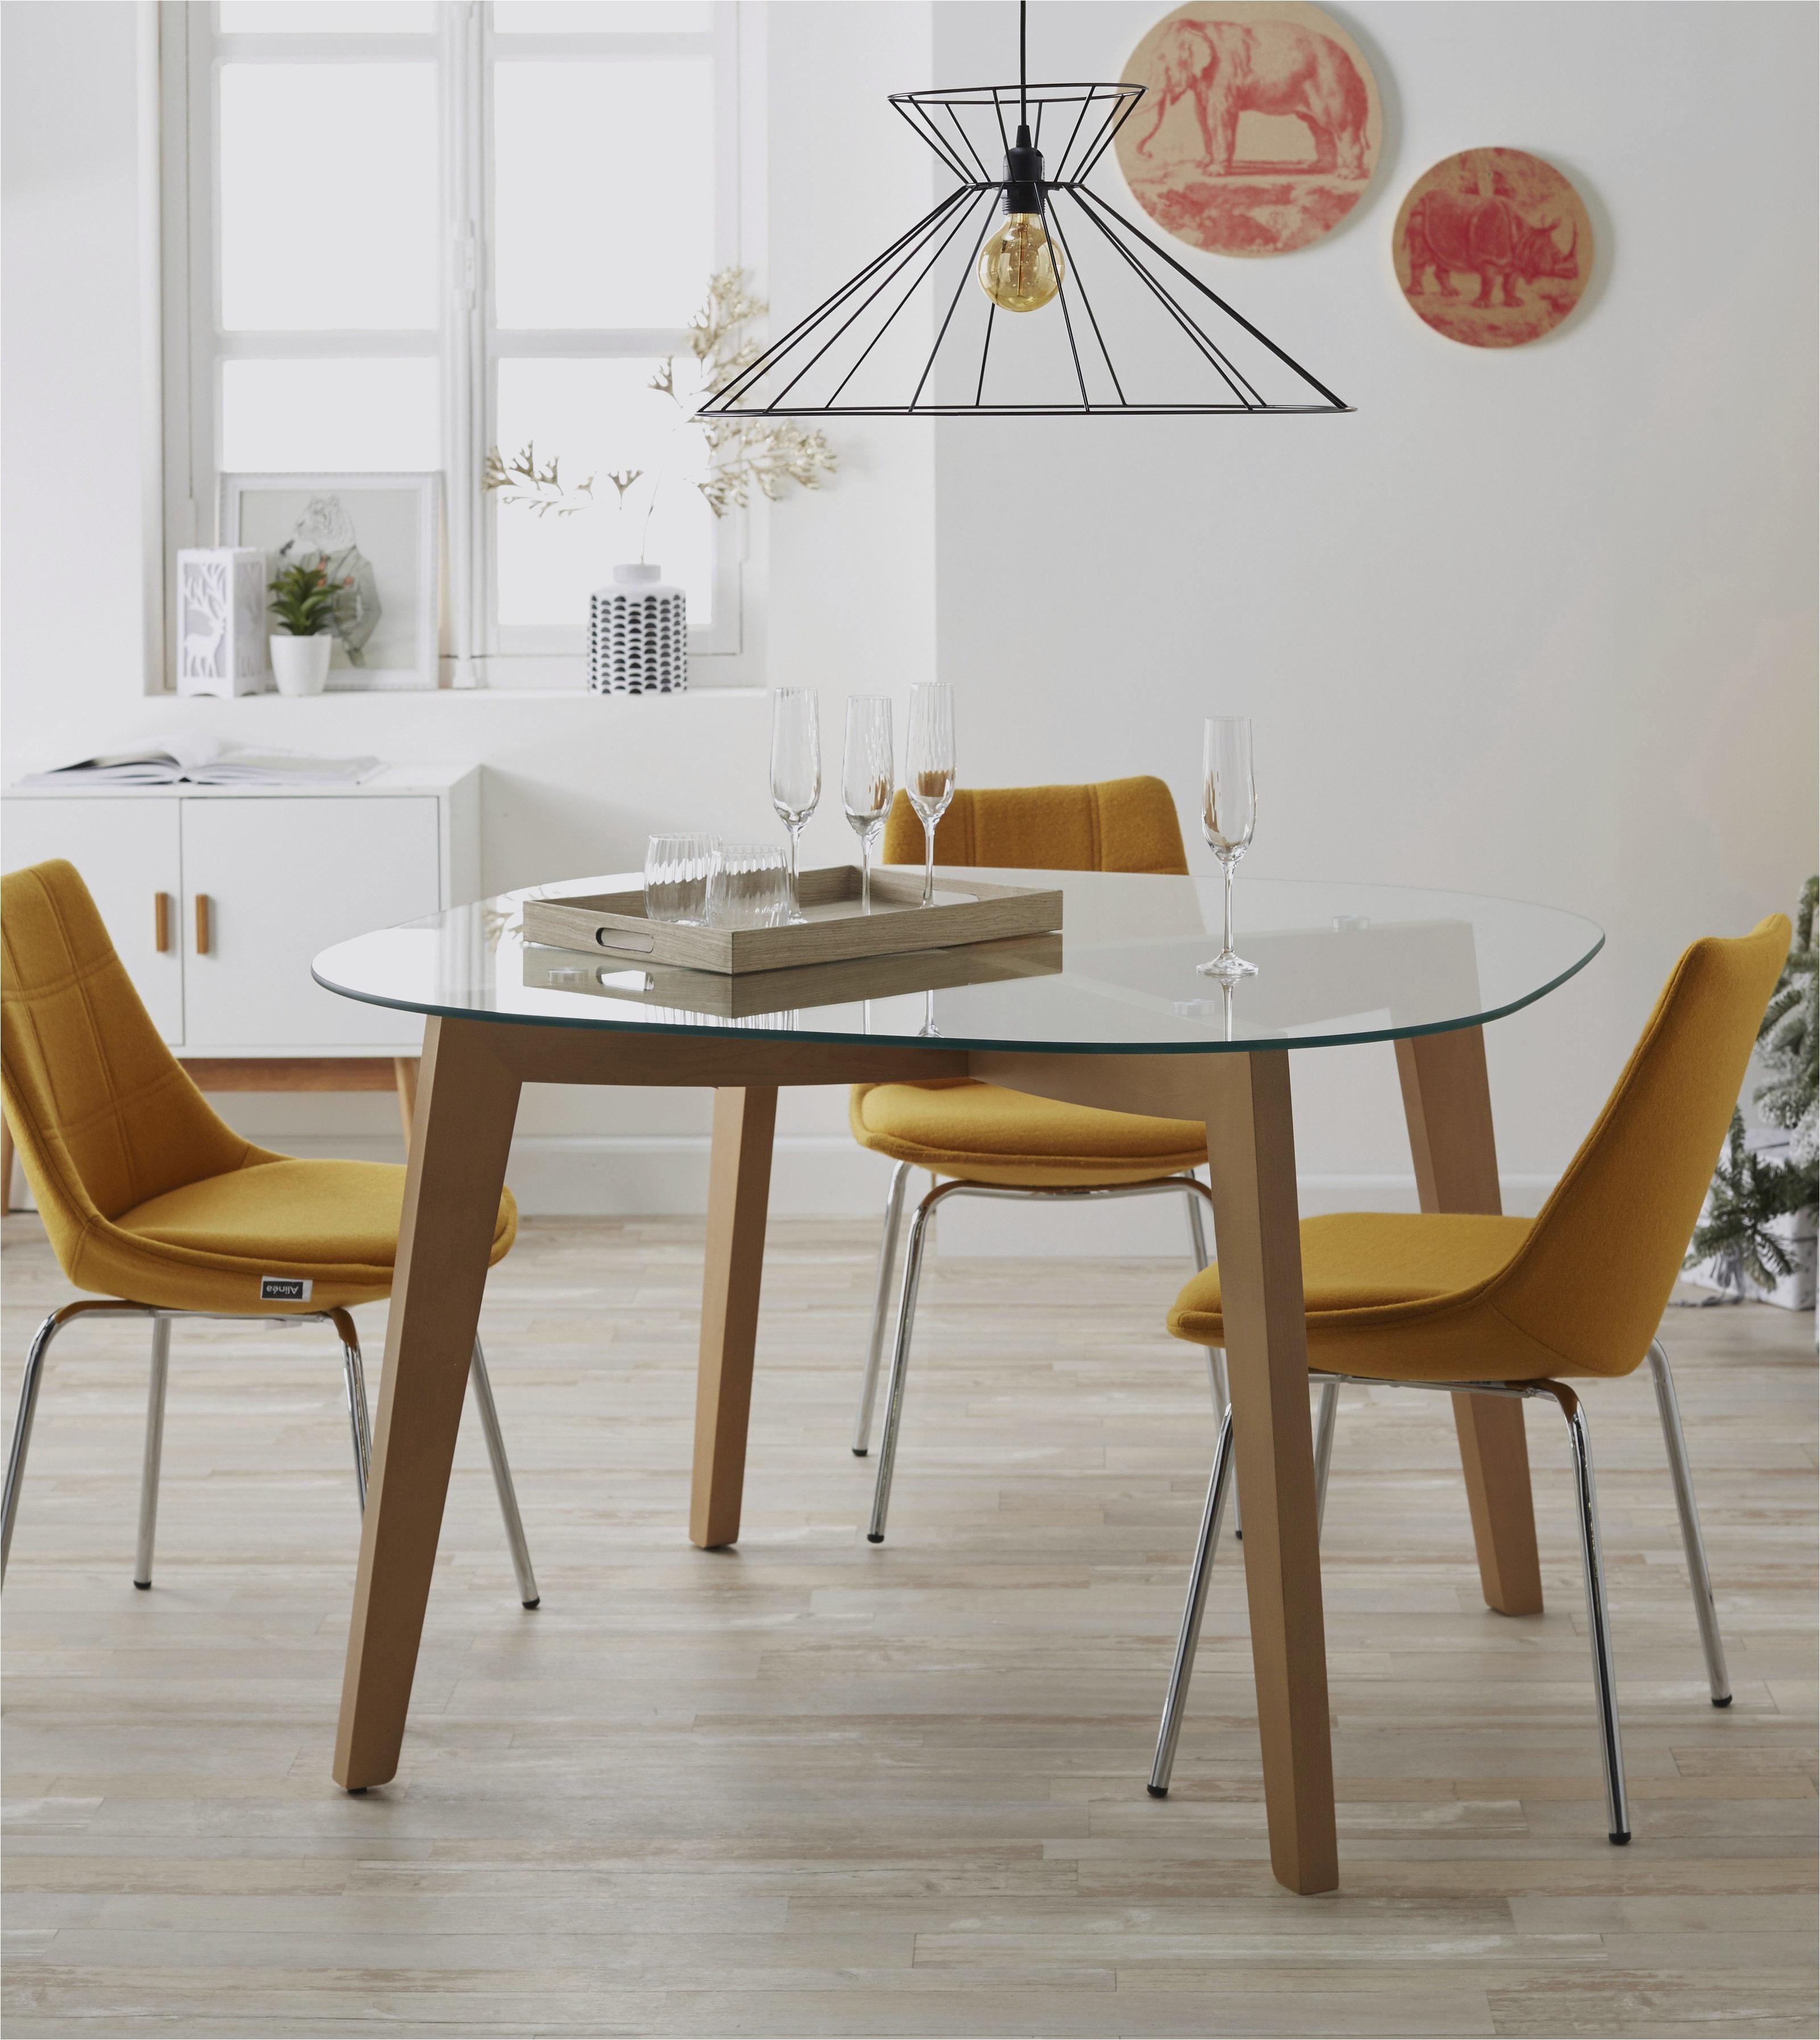 Table Pliante Carrefour Beau Stock Table Pliante Carrefour Luxe Table Et Chaise Pliante Chaise Pliante